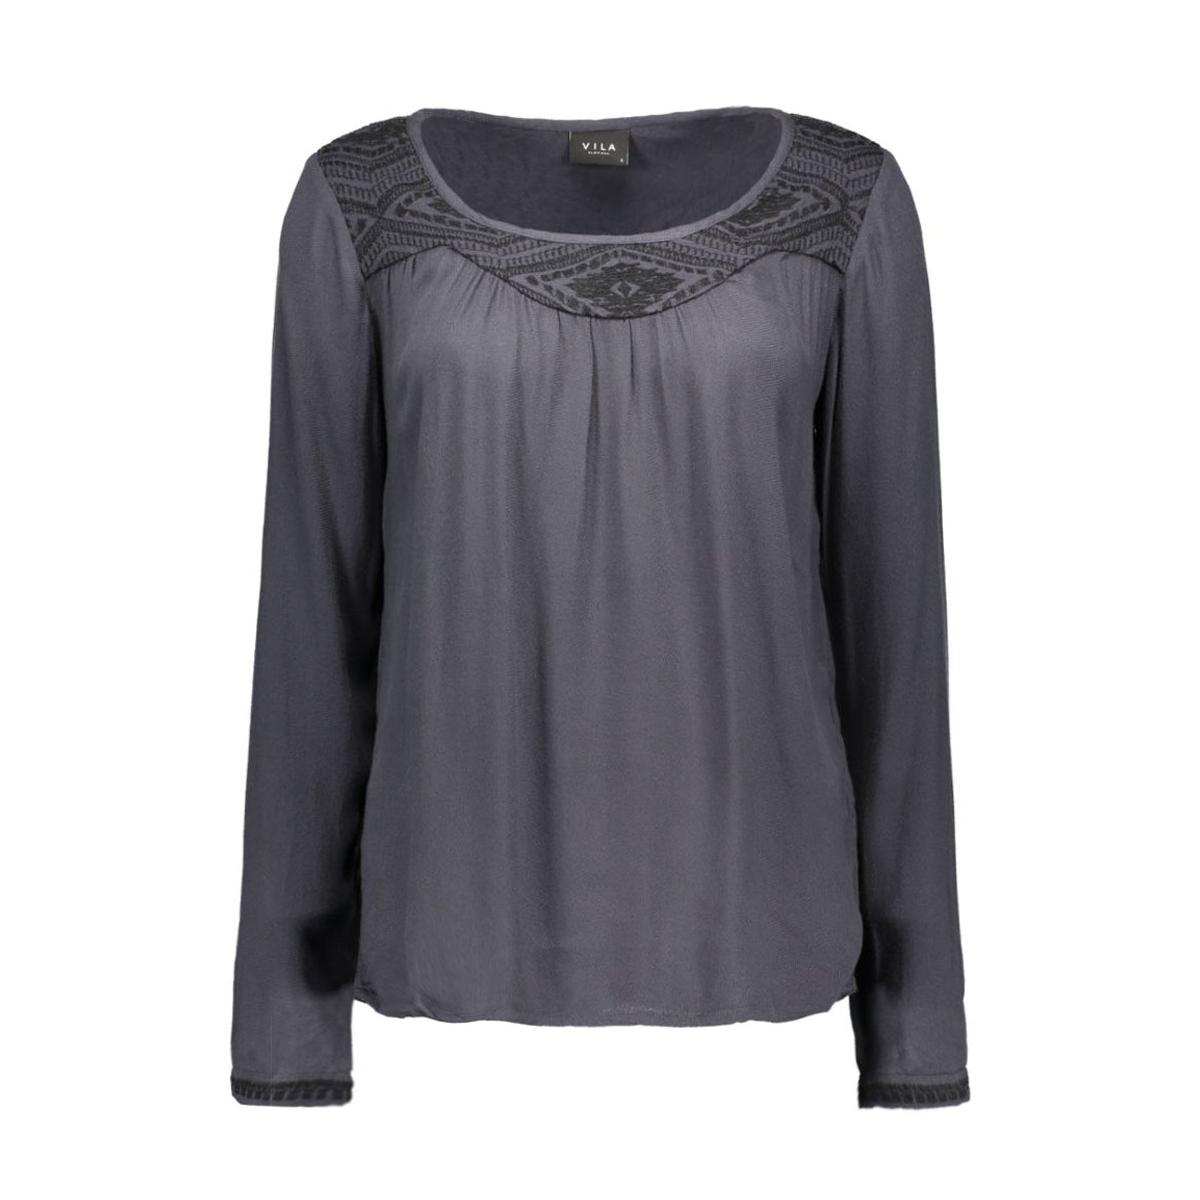 vicasy top 14036744 vila t-shirt ebony/black